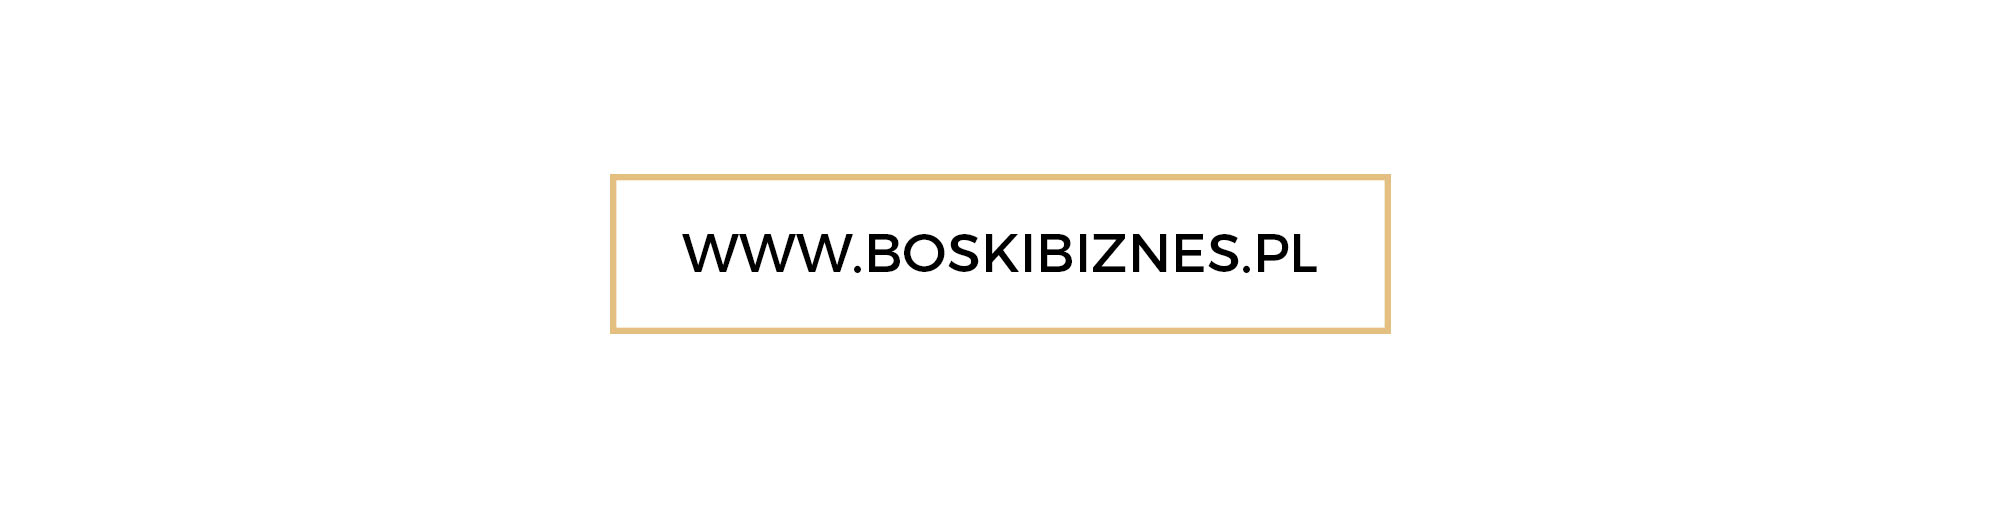 boski biznes